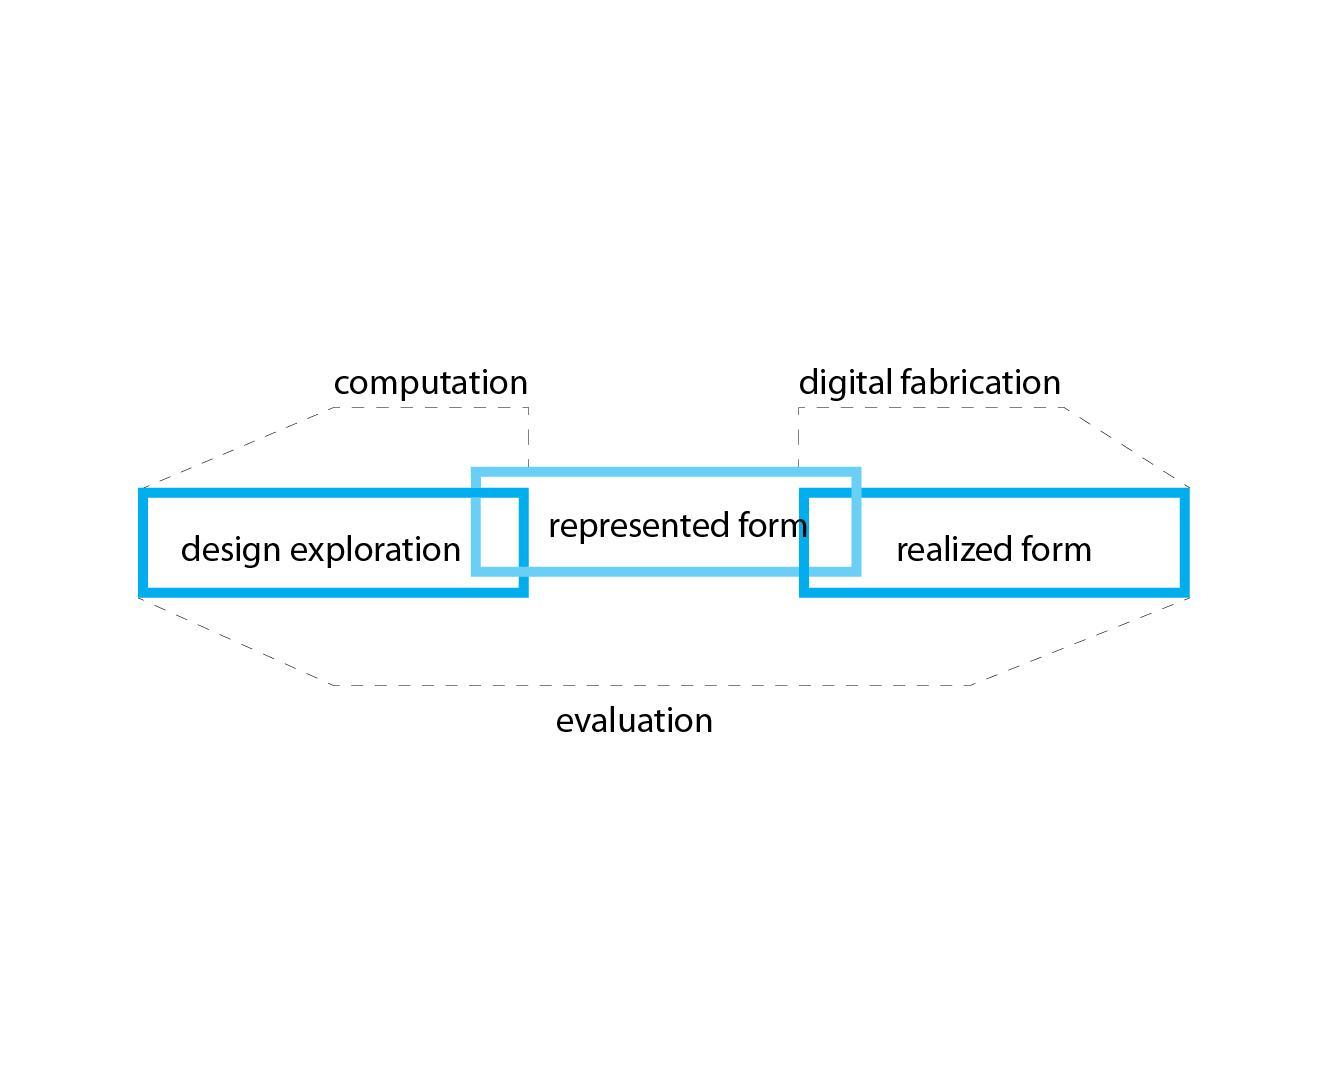 ecaade14_new_view_presentation_02_concept